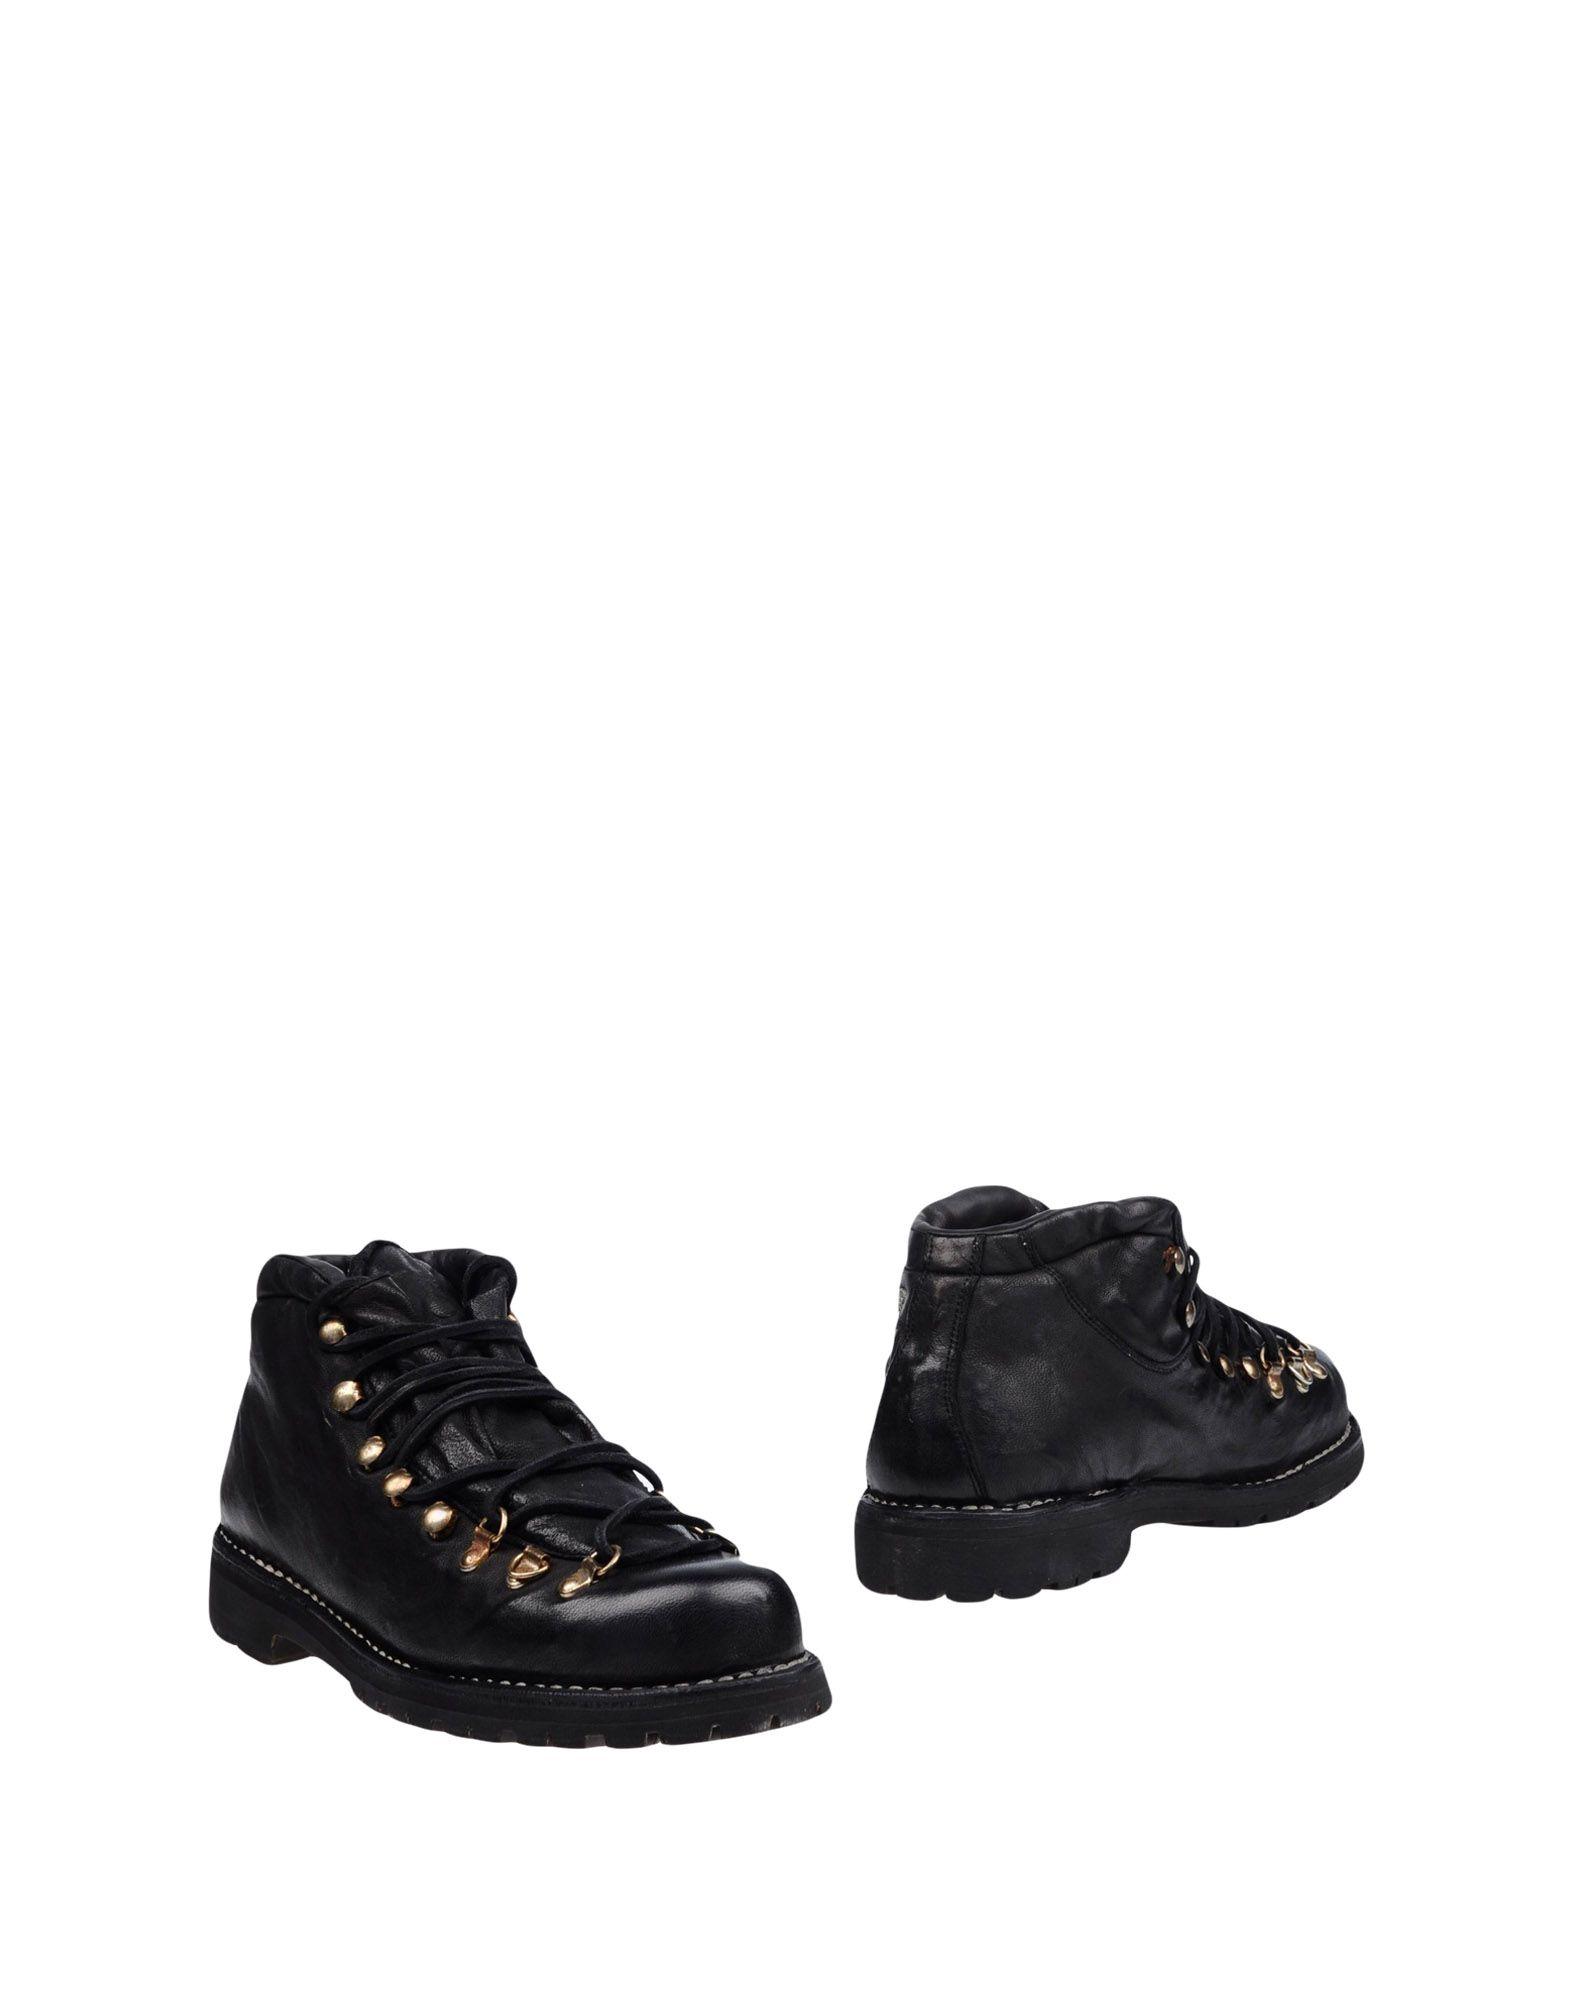 LE CORTINA by ANDREA VENTURA Полусапоги и высокие ботинки le cortina by andrea ventura полусапоги и высокие ботинки